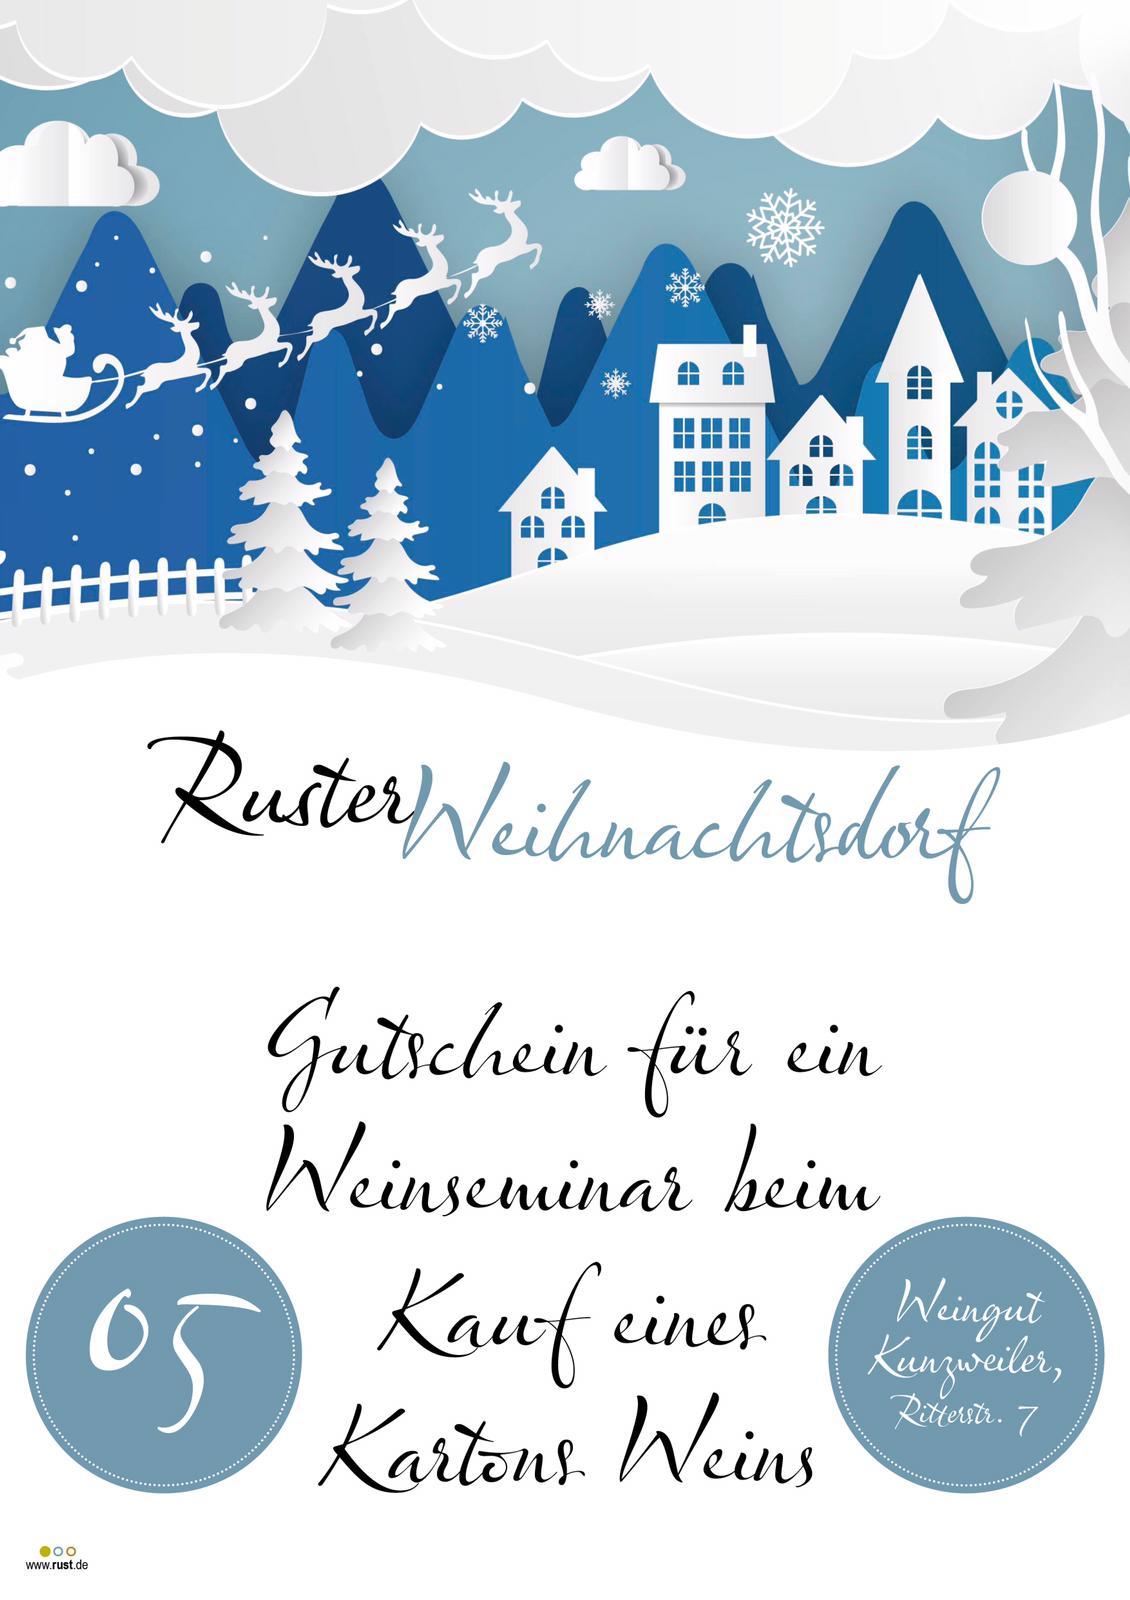 Ruster Adventskalender Türchen 5